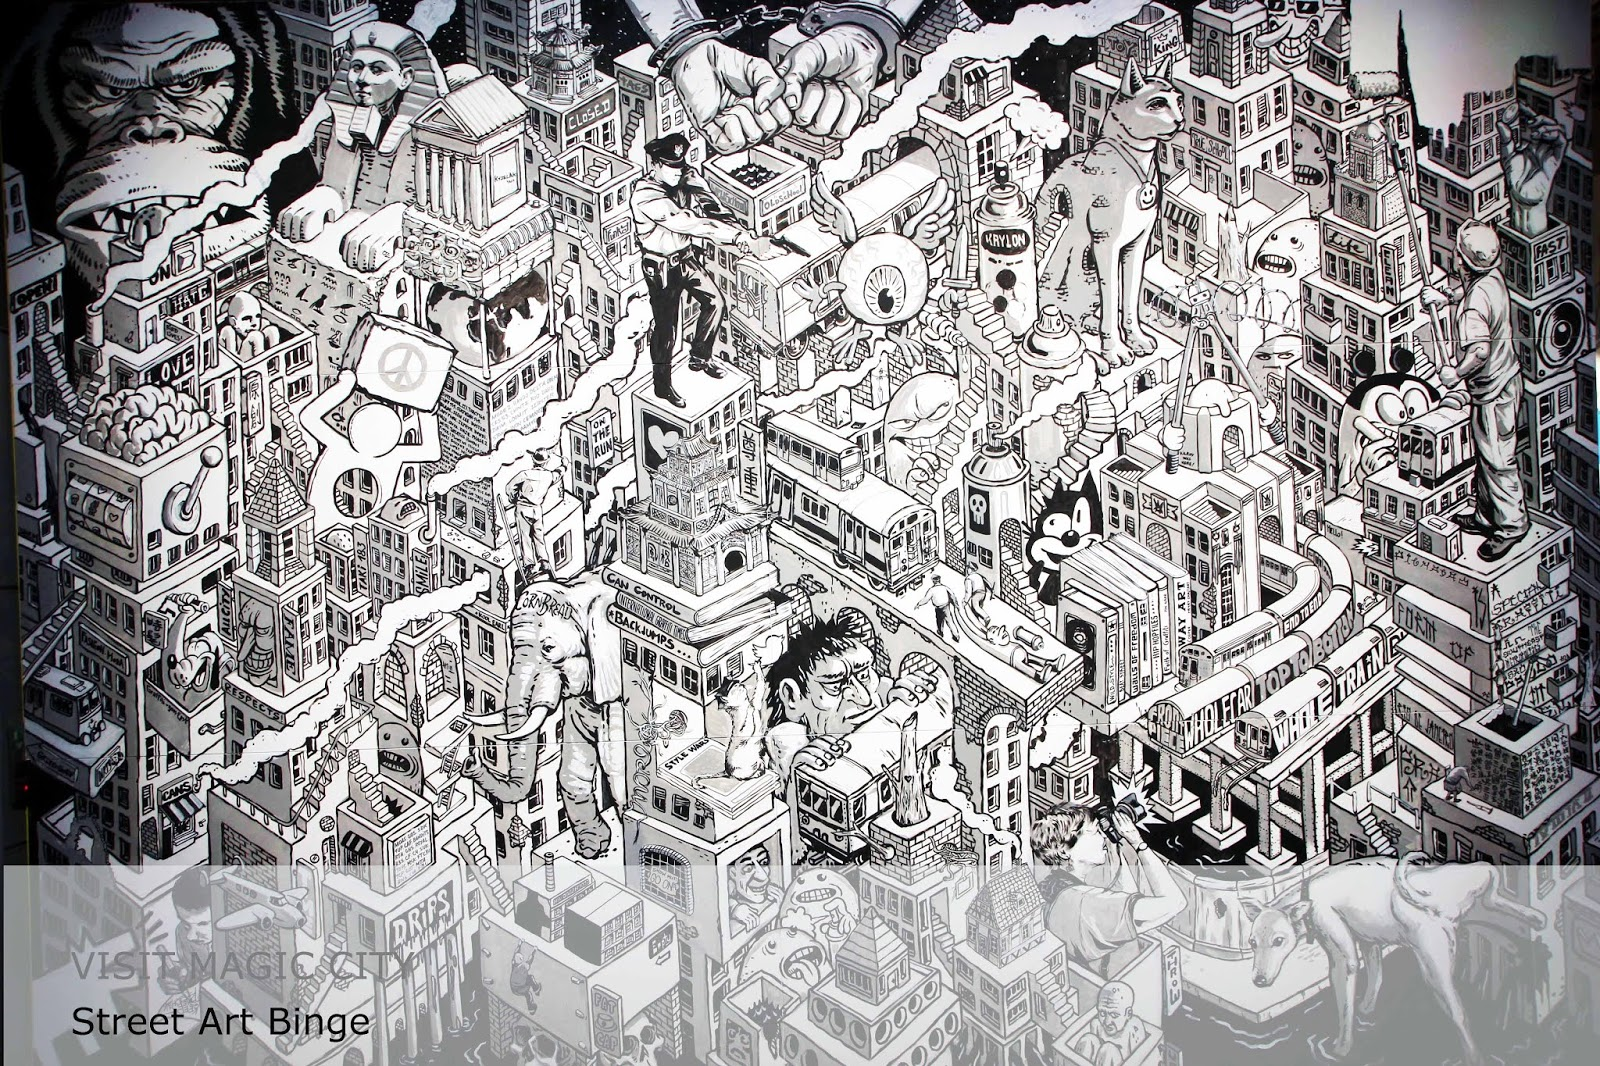 The Touristin Visit Magic City Street Art Binge